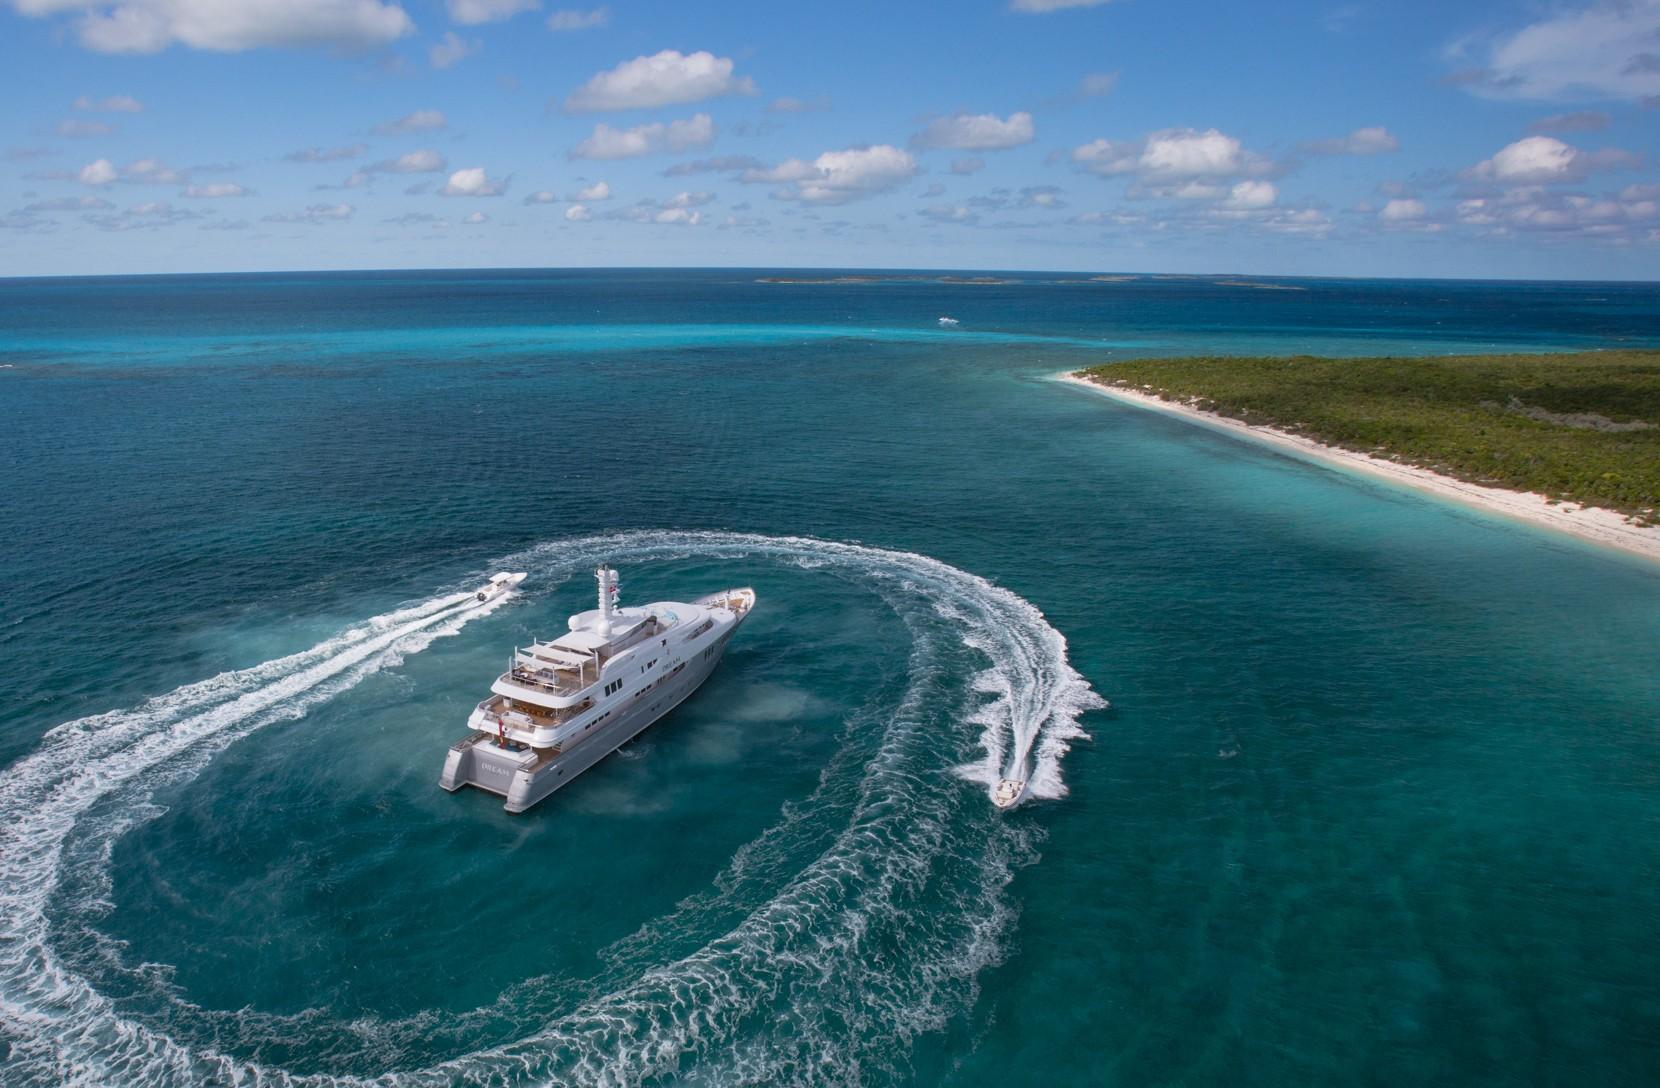 Alquiler de yates en la Polinesia Francesa. Alquiler de barcos en la Polinesia Francesa